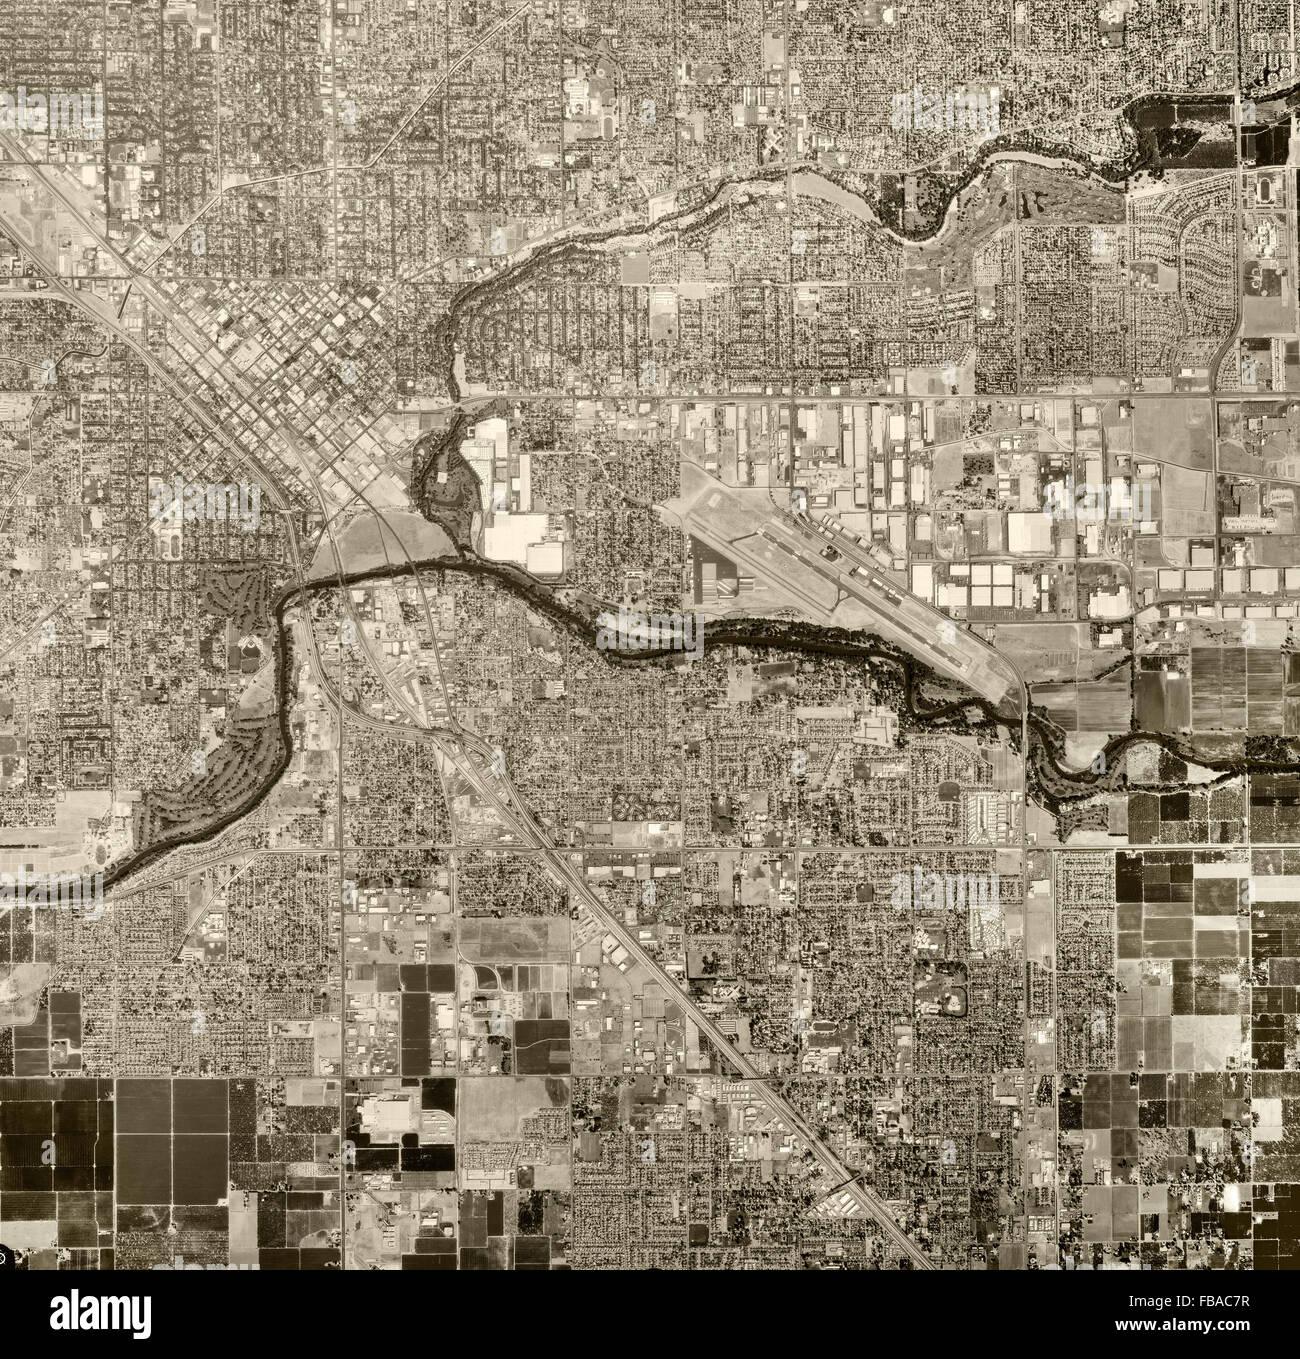 historical aerial photograph Modesto, Stanislaus County, California, 1998 - Stock Image